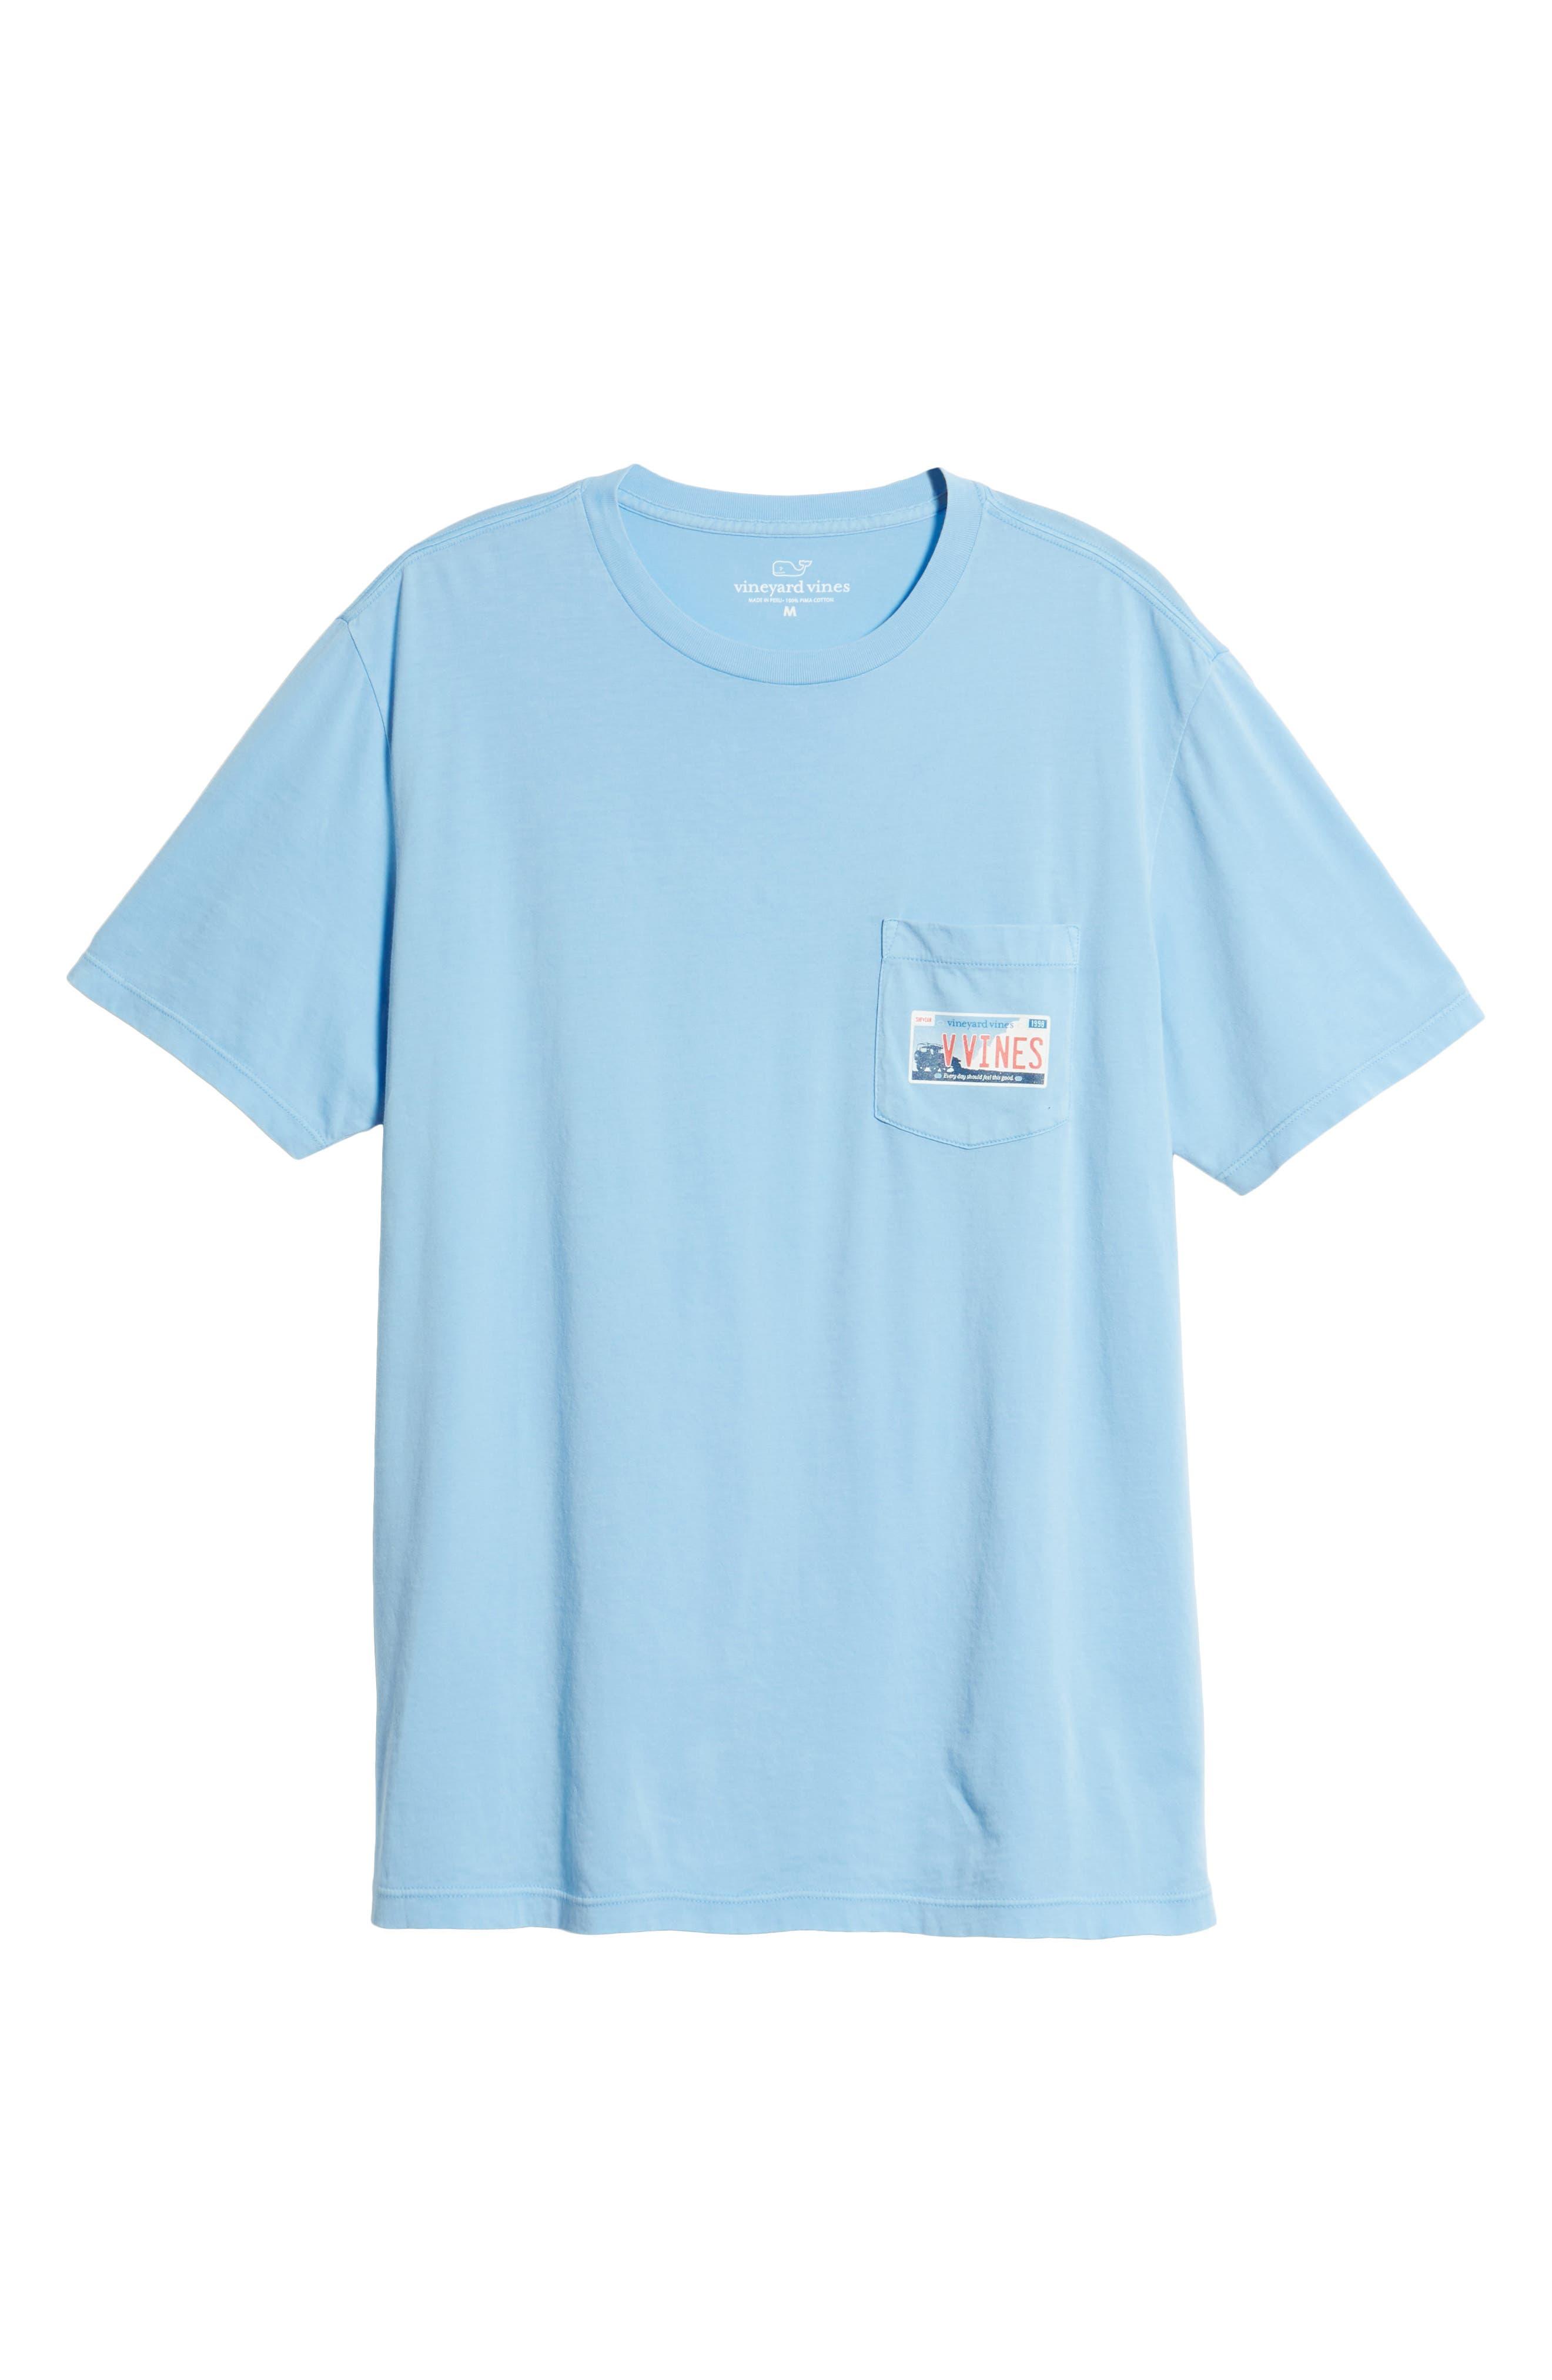 Tie Guys Plate Regular Fit Crewneck T-Shirt,                             Alternate thumbnail 6, color,                             456